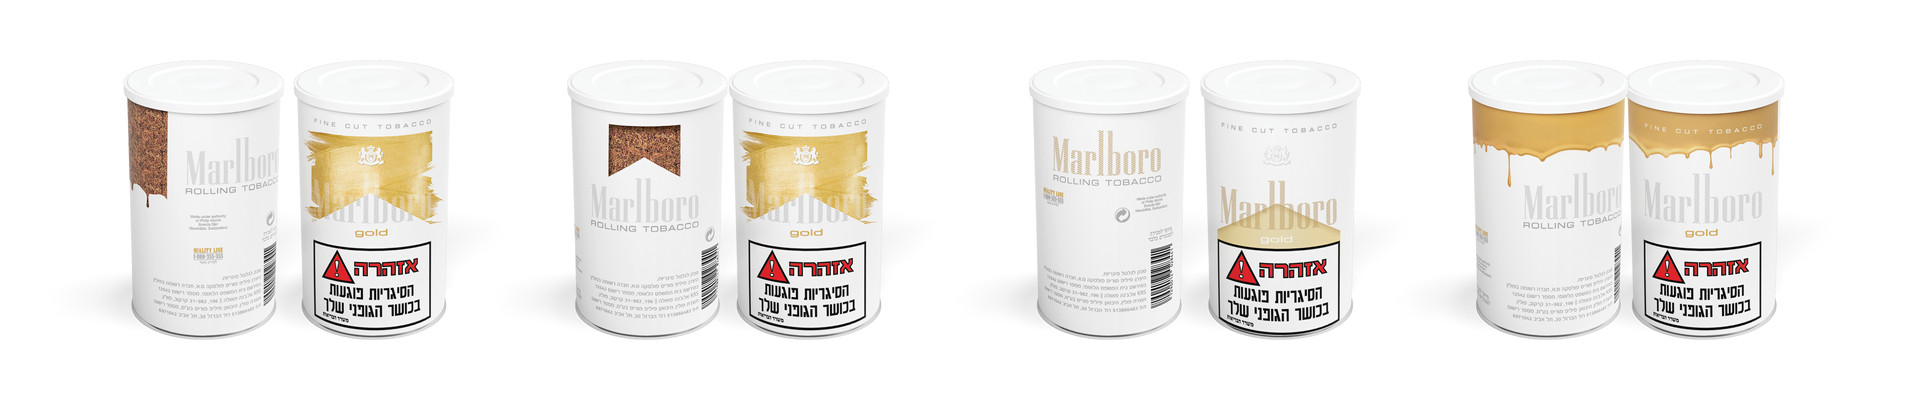 Tin pack Marlboro gold mocks.jpg